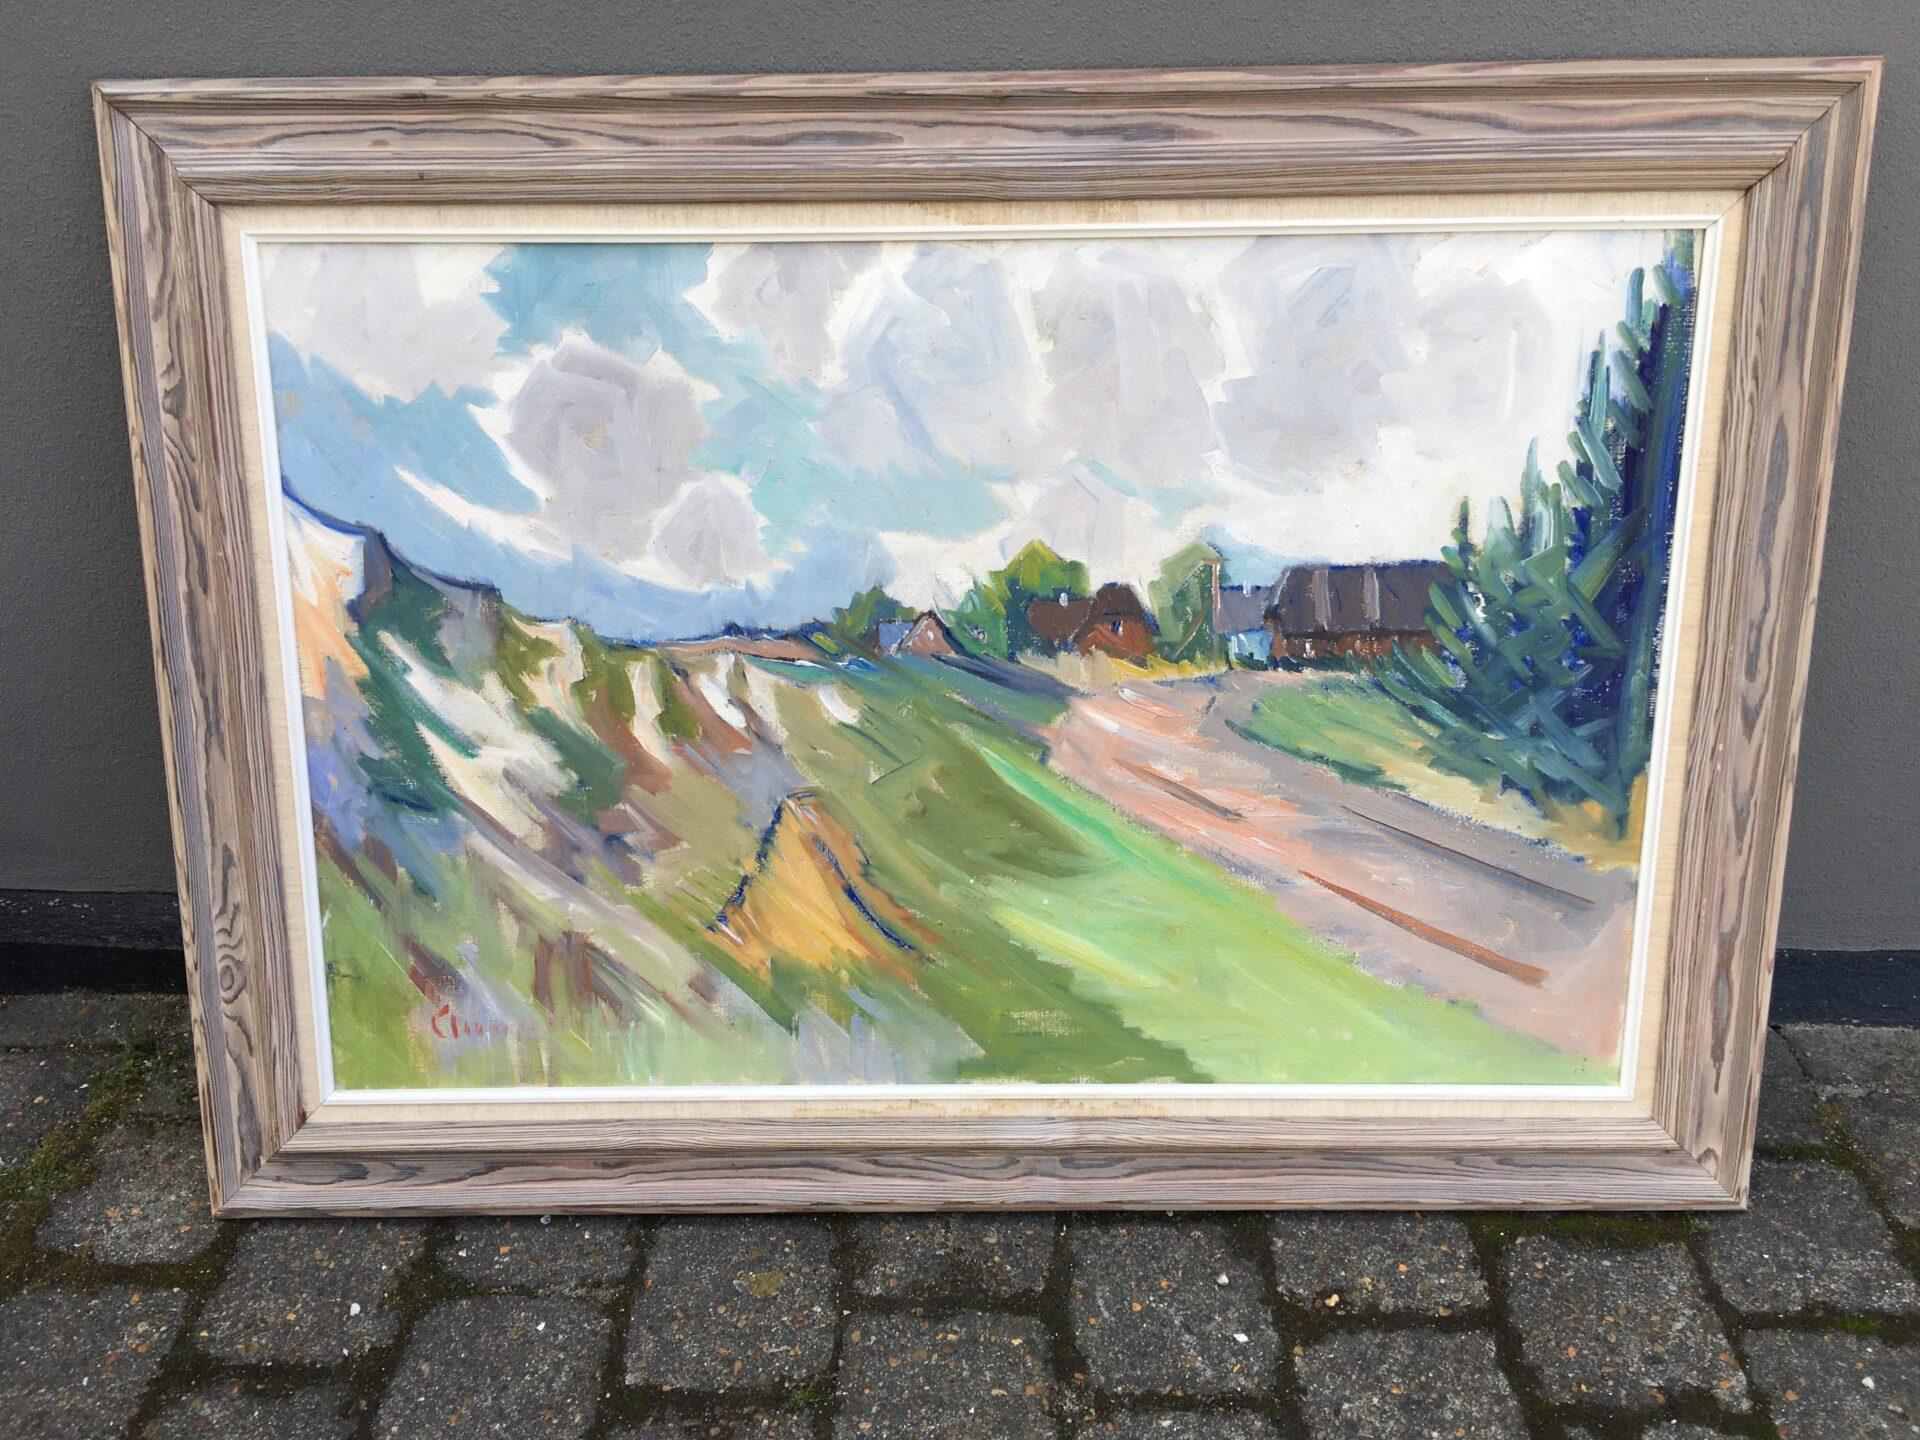 Arnold W. Pedersen, rammemål 86x118 cm, pris 800 kr